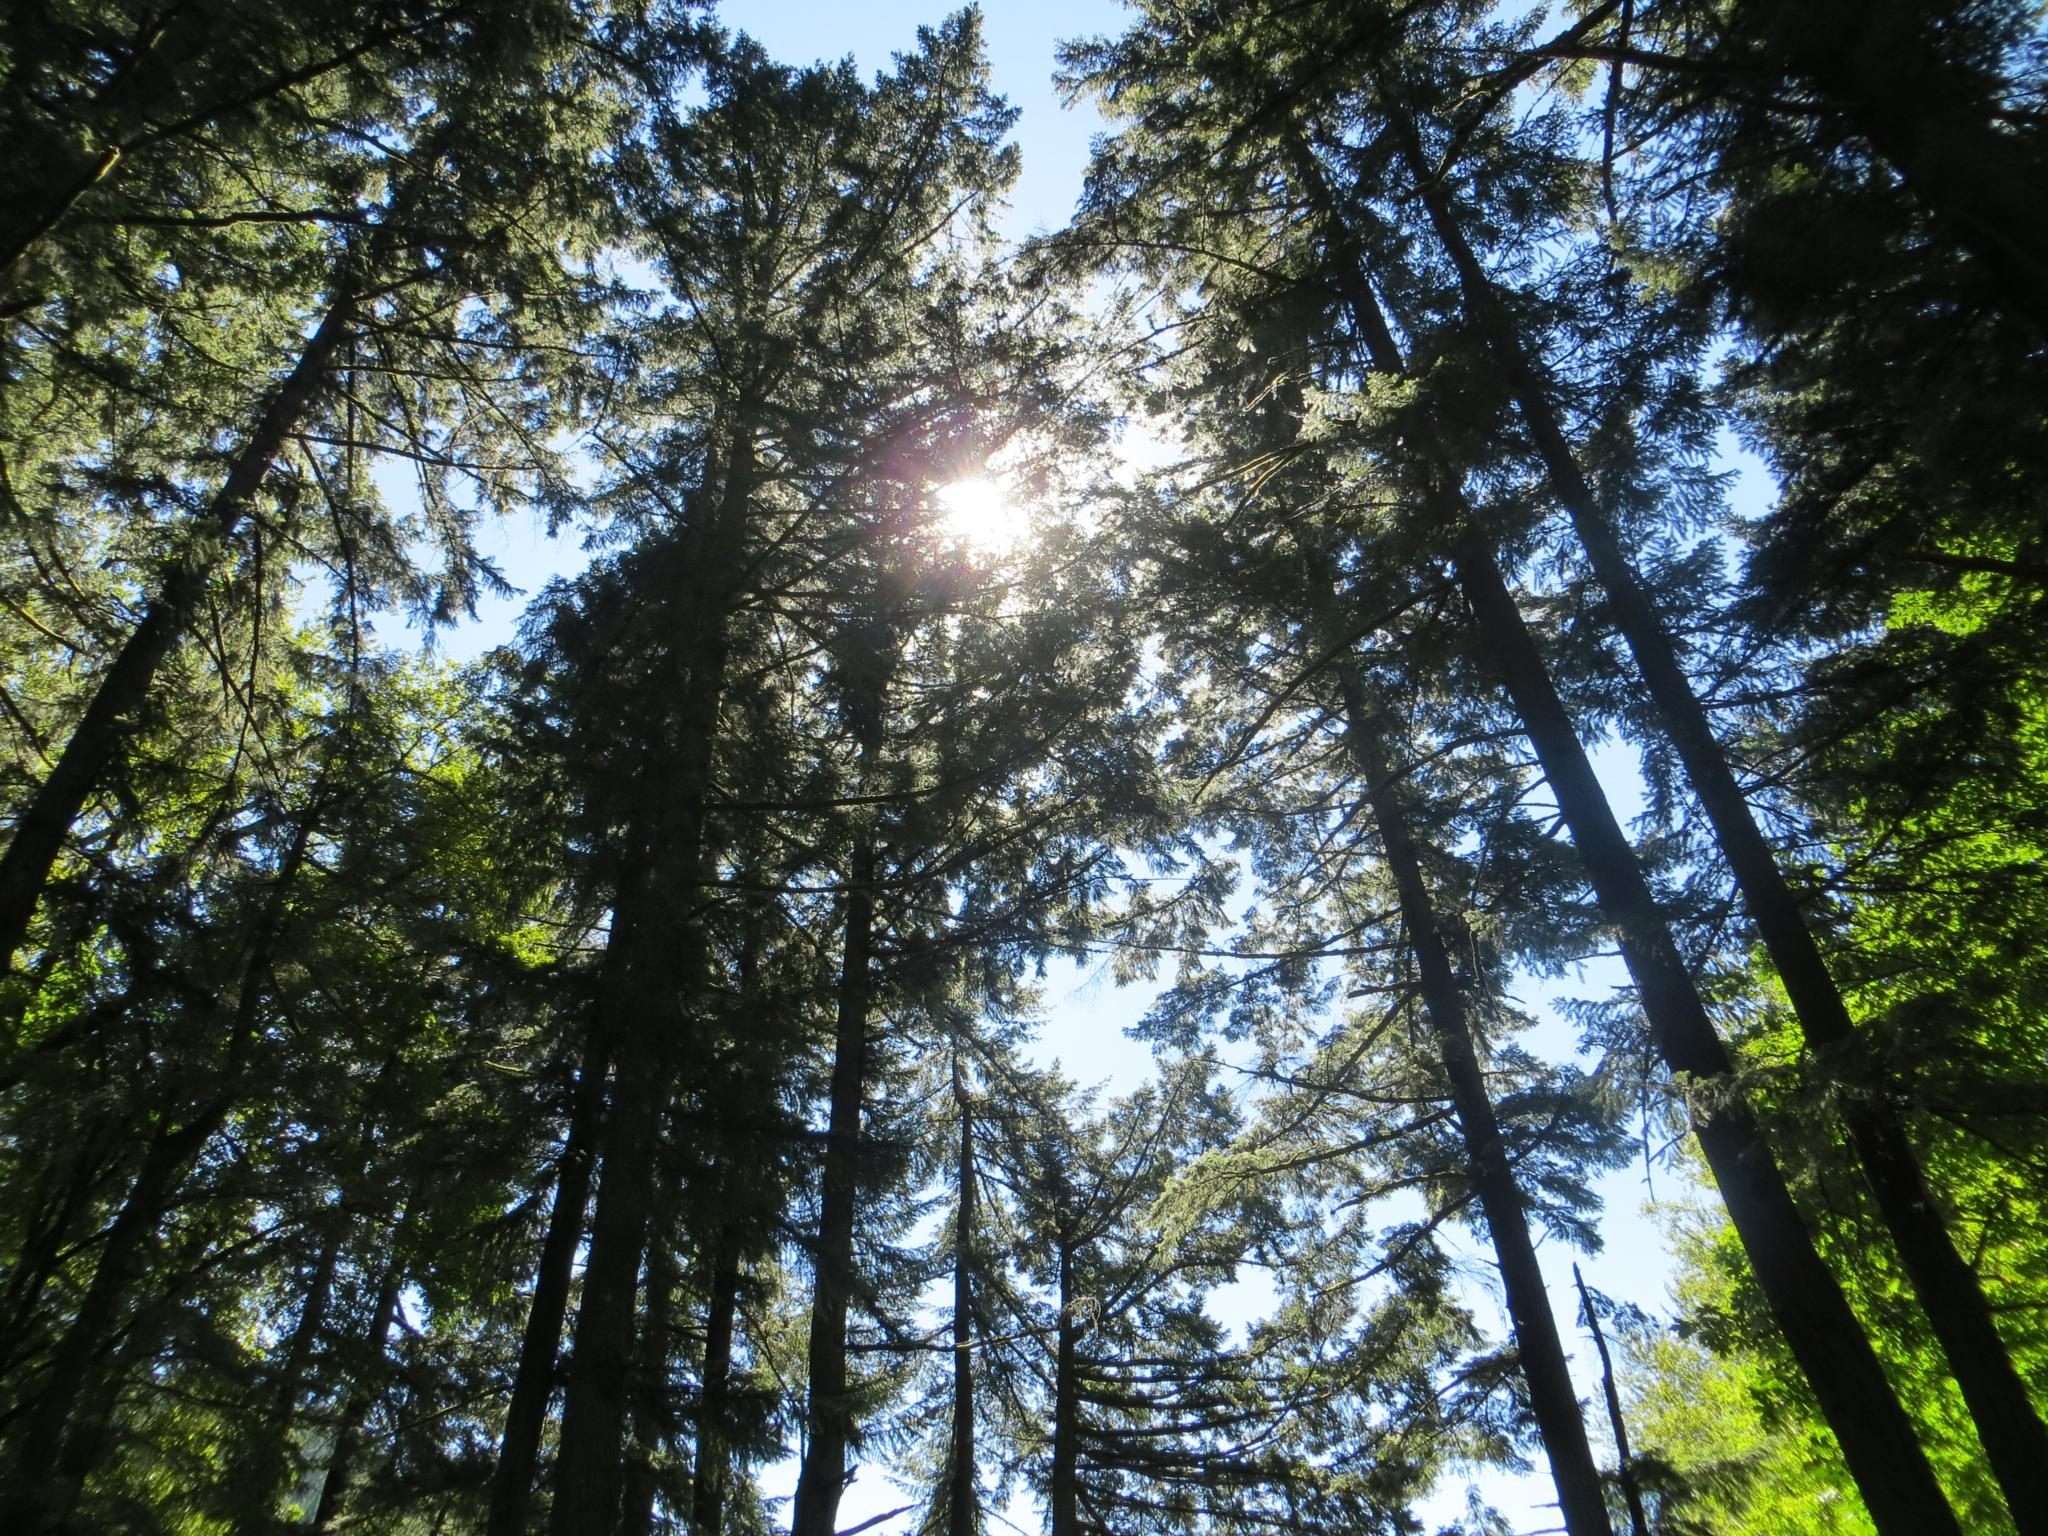 Towering trees by Barbara Stockford